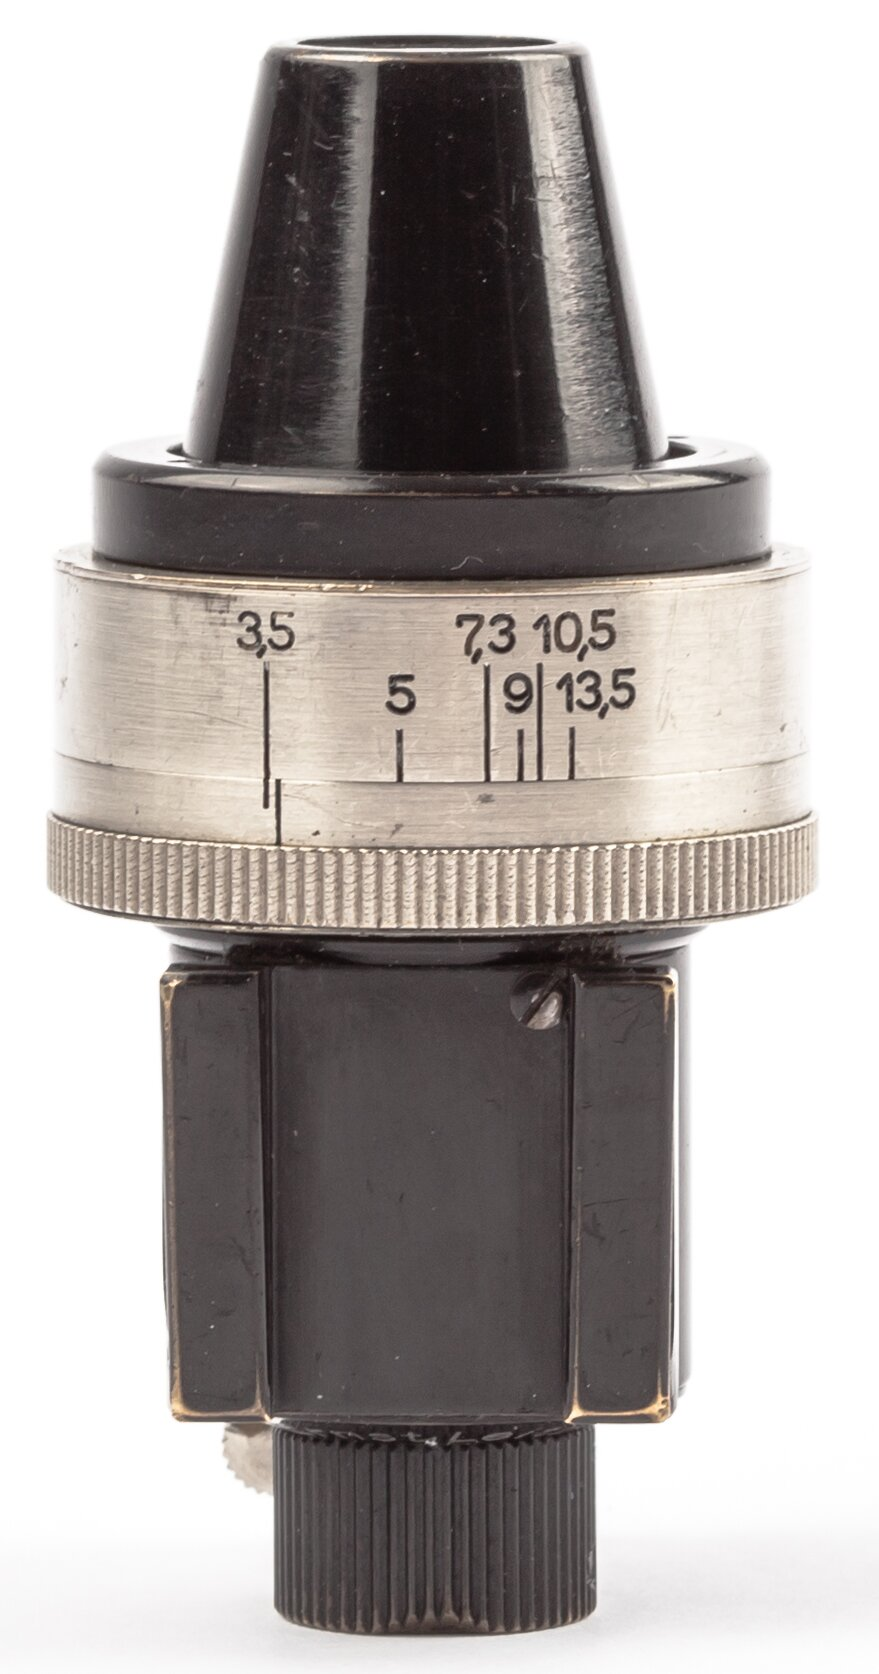 Leica VIDOM Nickel